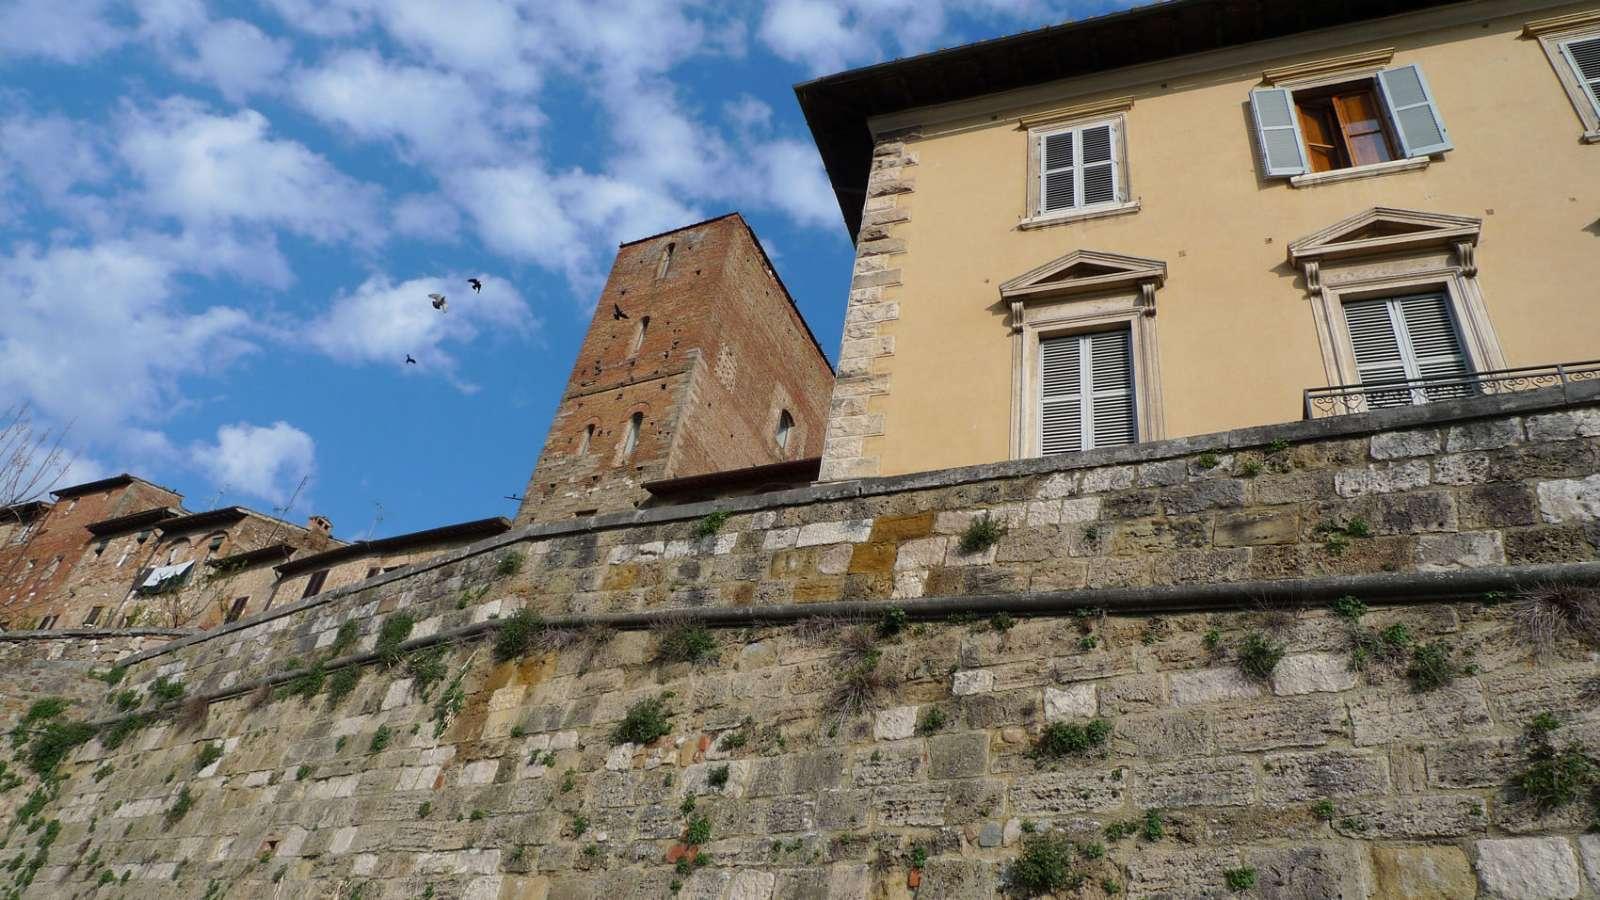 Torre di Arnolfo från 1200-talet